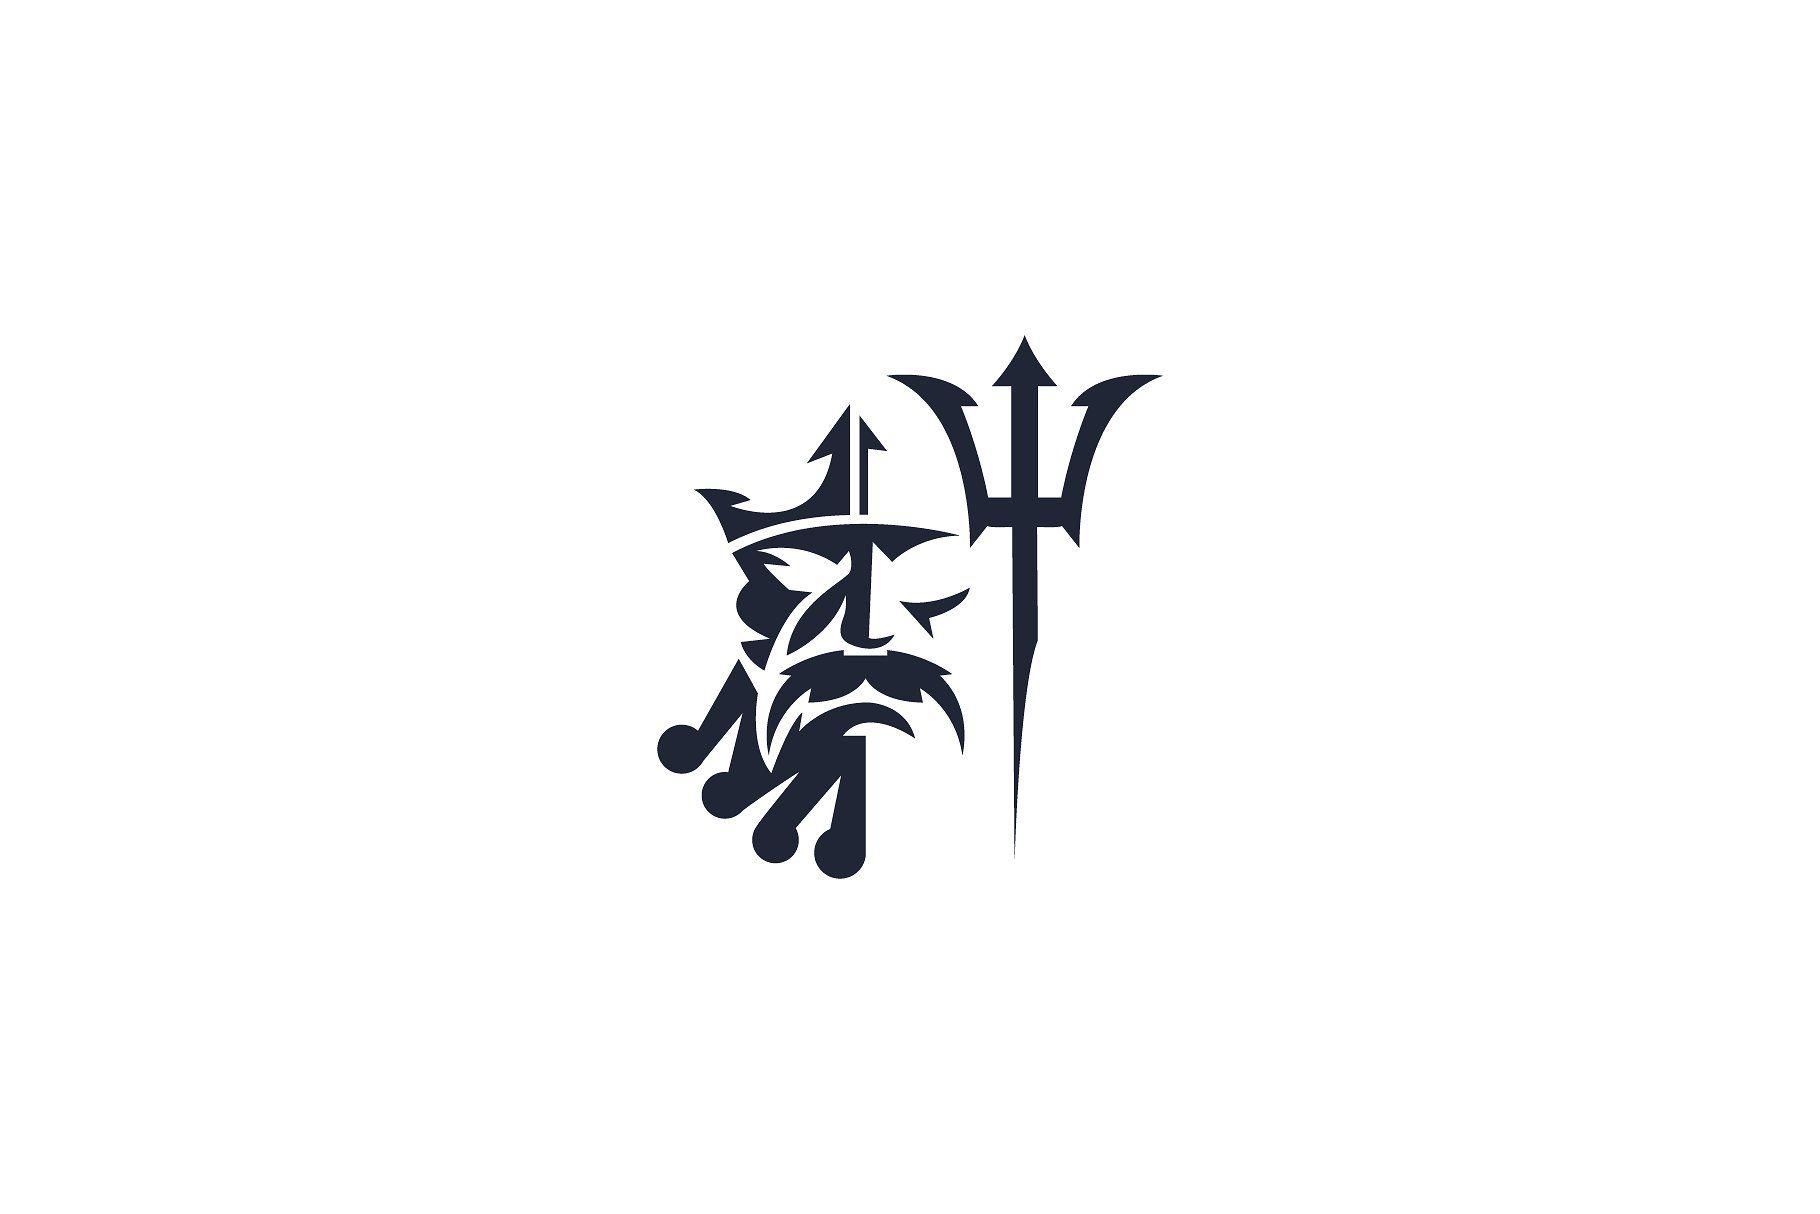 Poseidon logo god of water #layers#organized#highly#Ready.